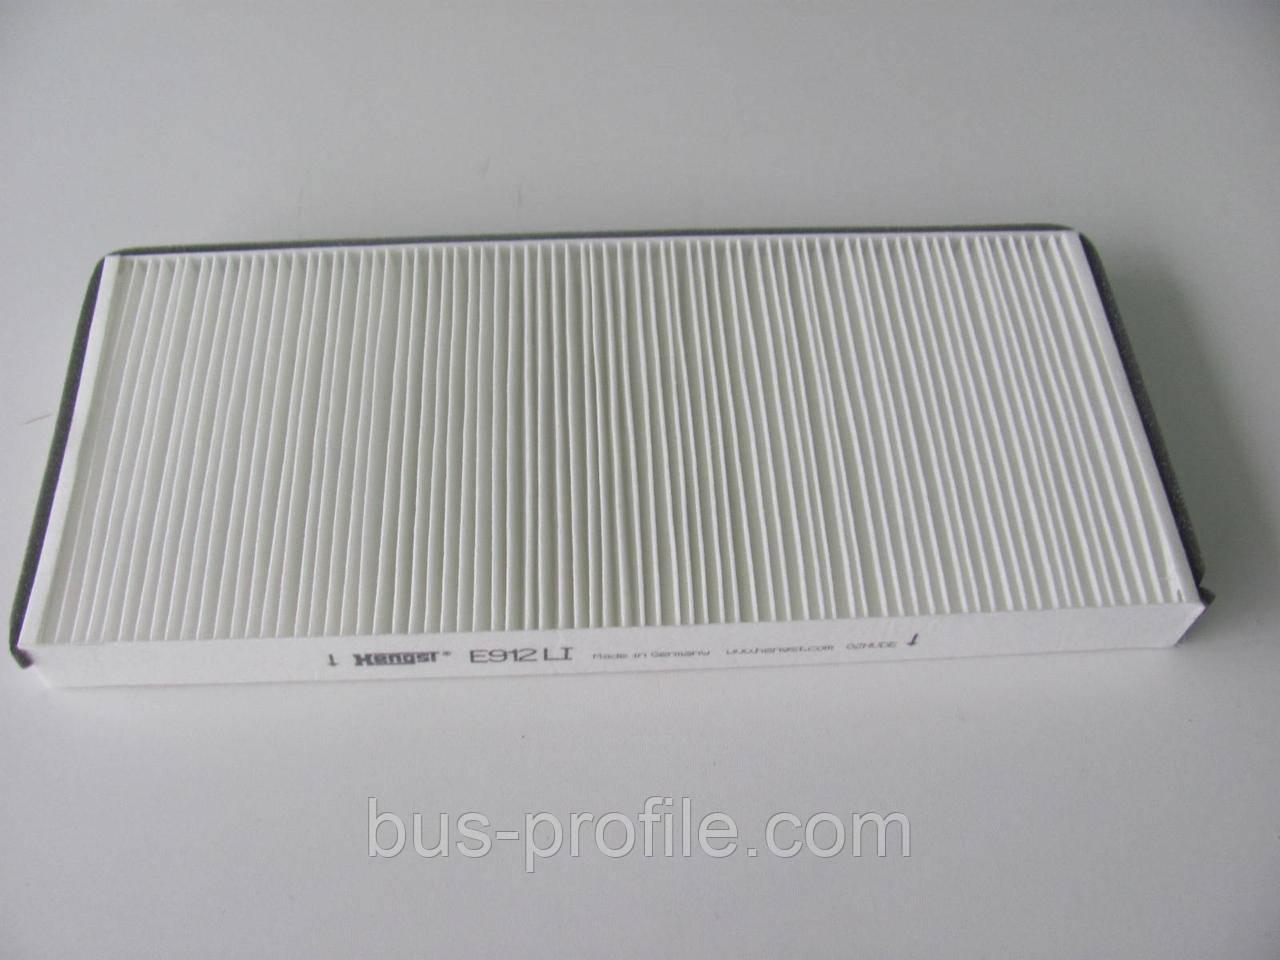 Фильтр салона Mercedes Benz Sprinter / VW LT 95-> — HENGST — E912LI